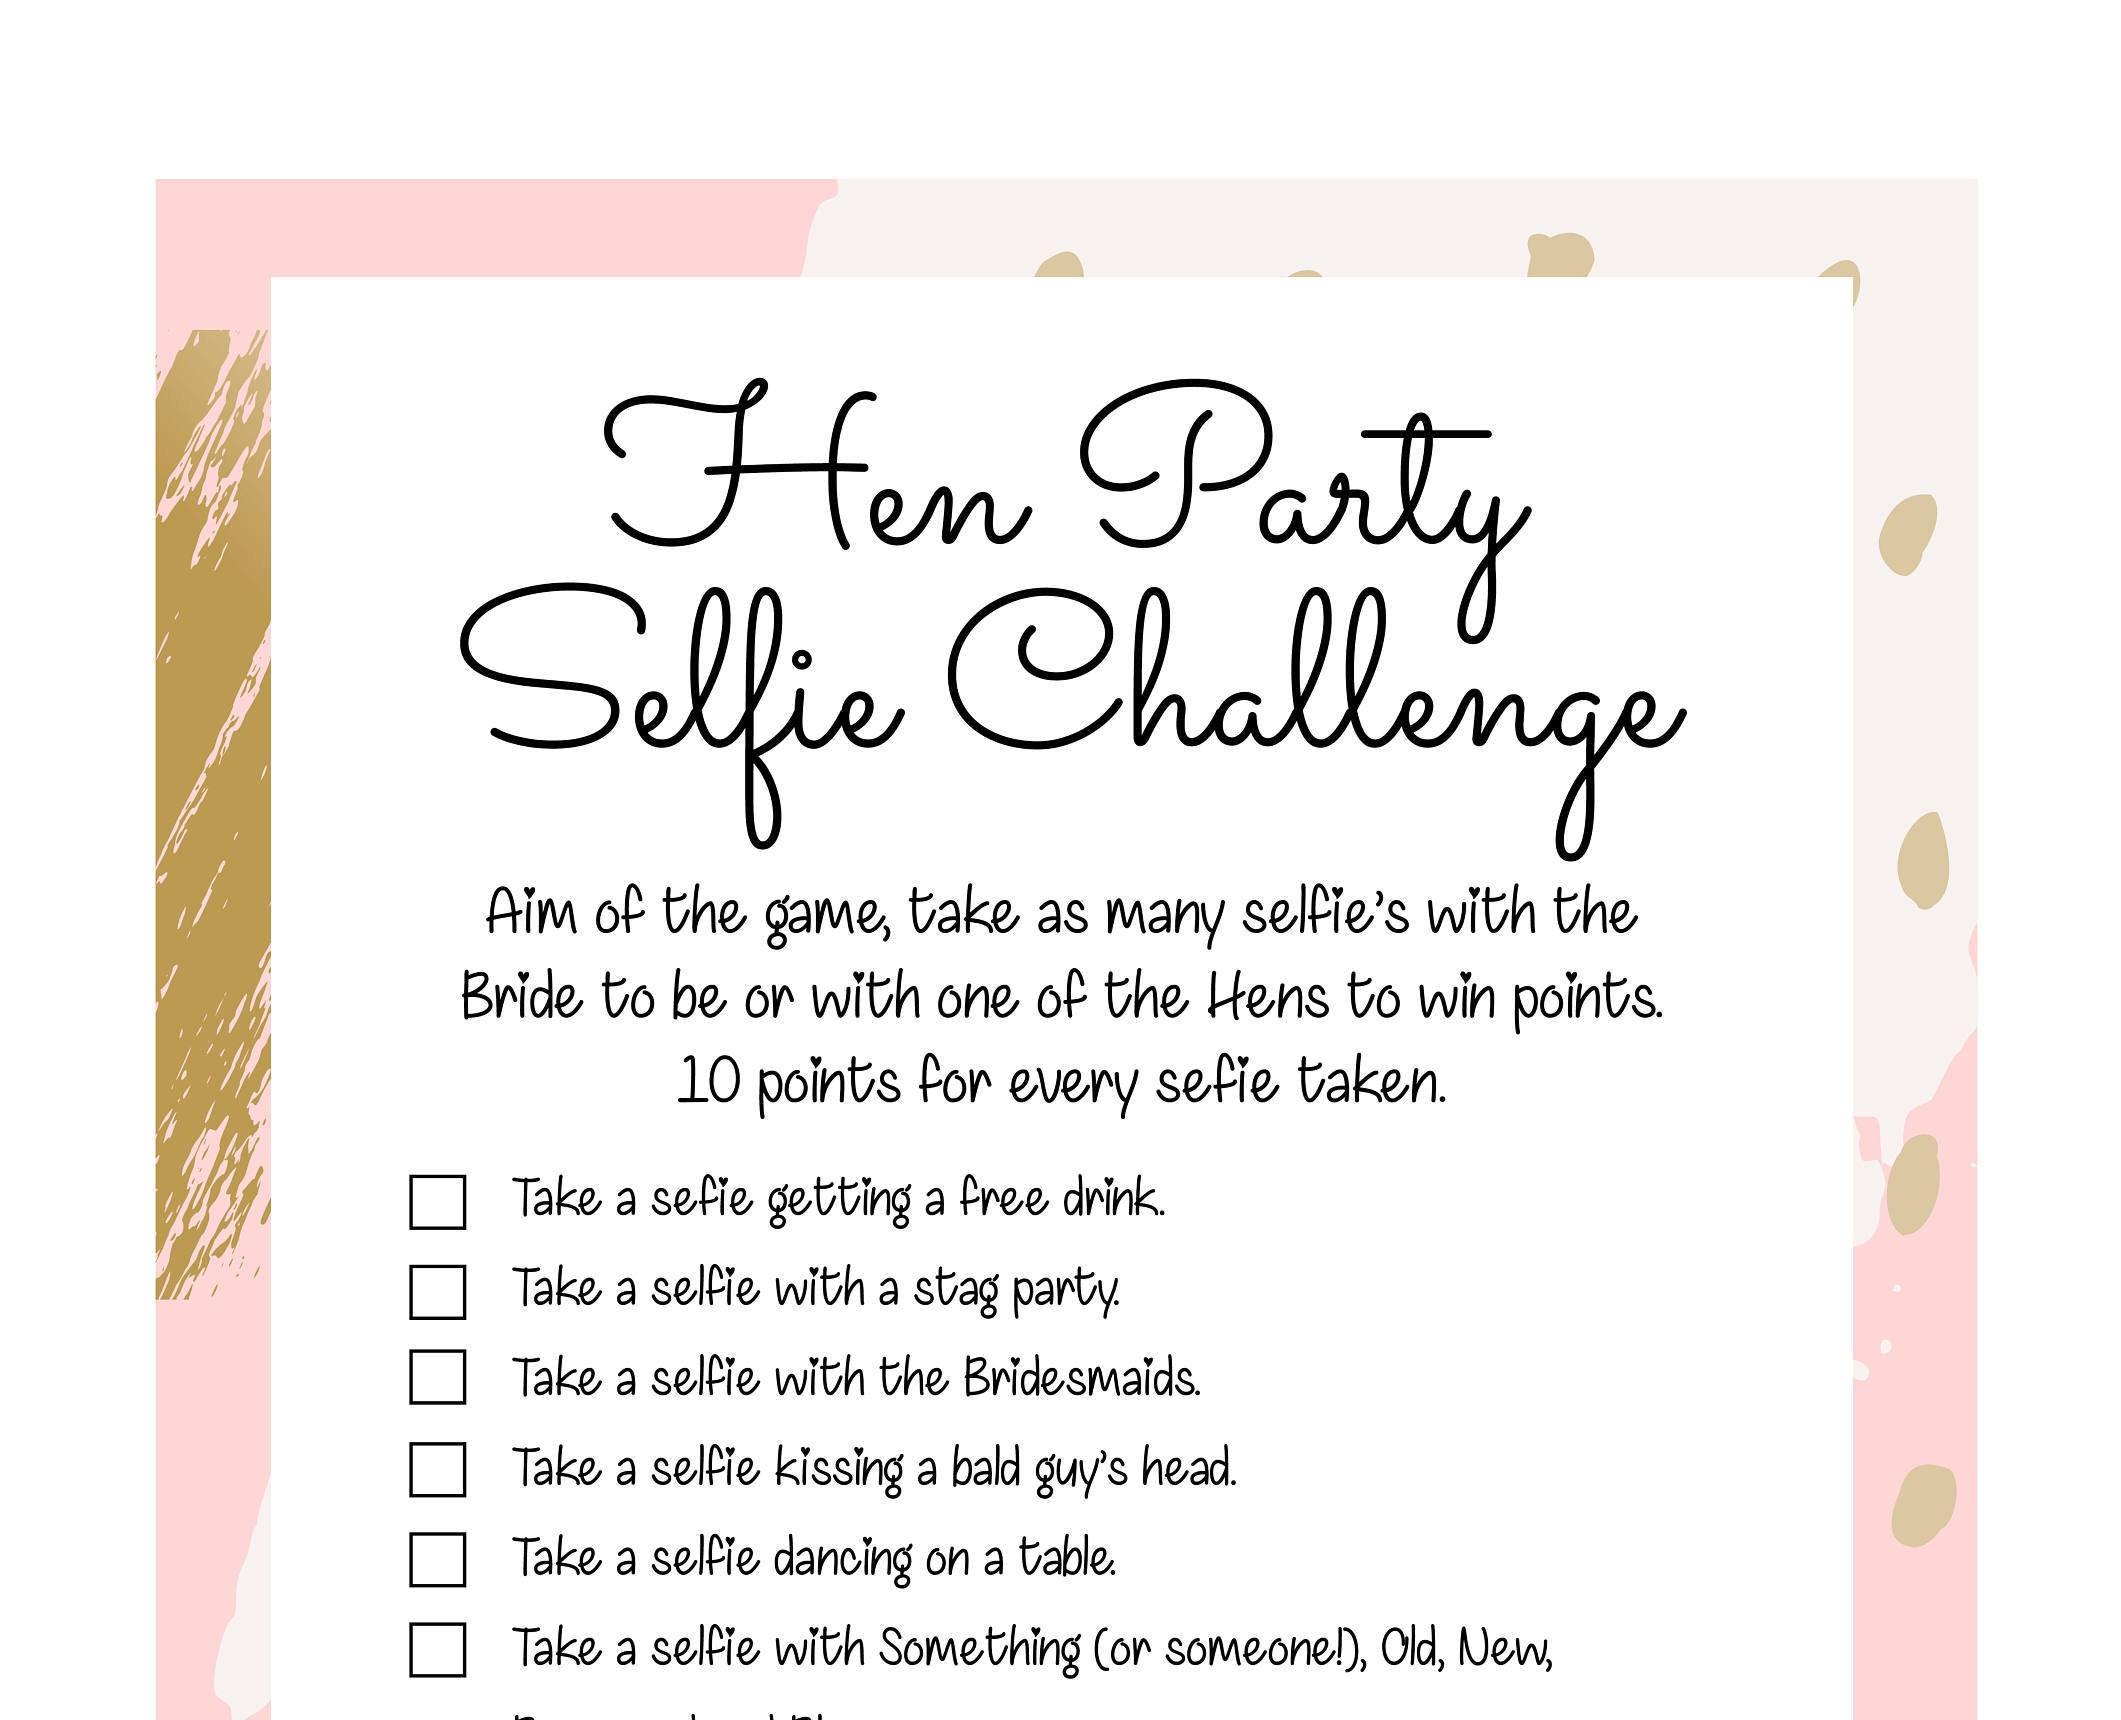 Hen Party Games Hen Party Selfie Photo Challenge Hen Party